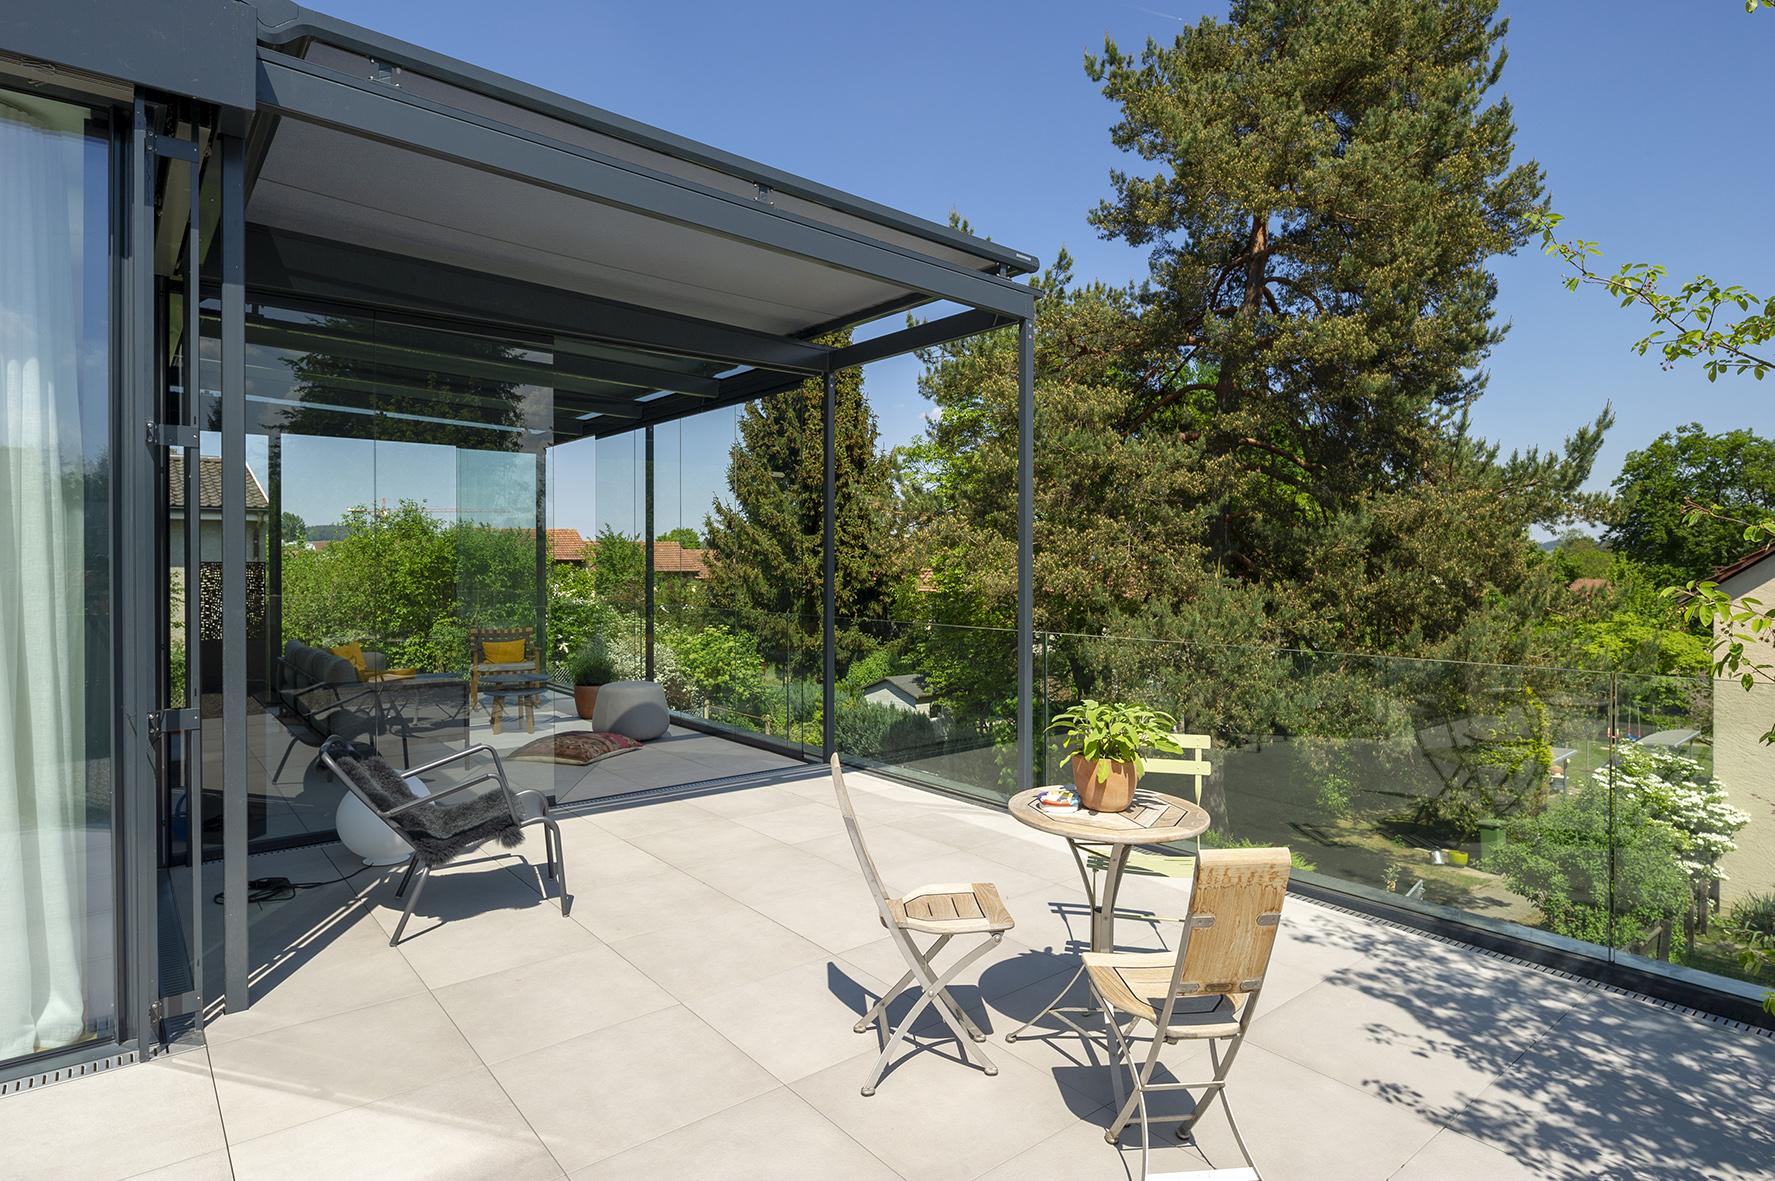 Neubau Einfamilienhaus, 8404 Winterthur